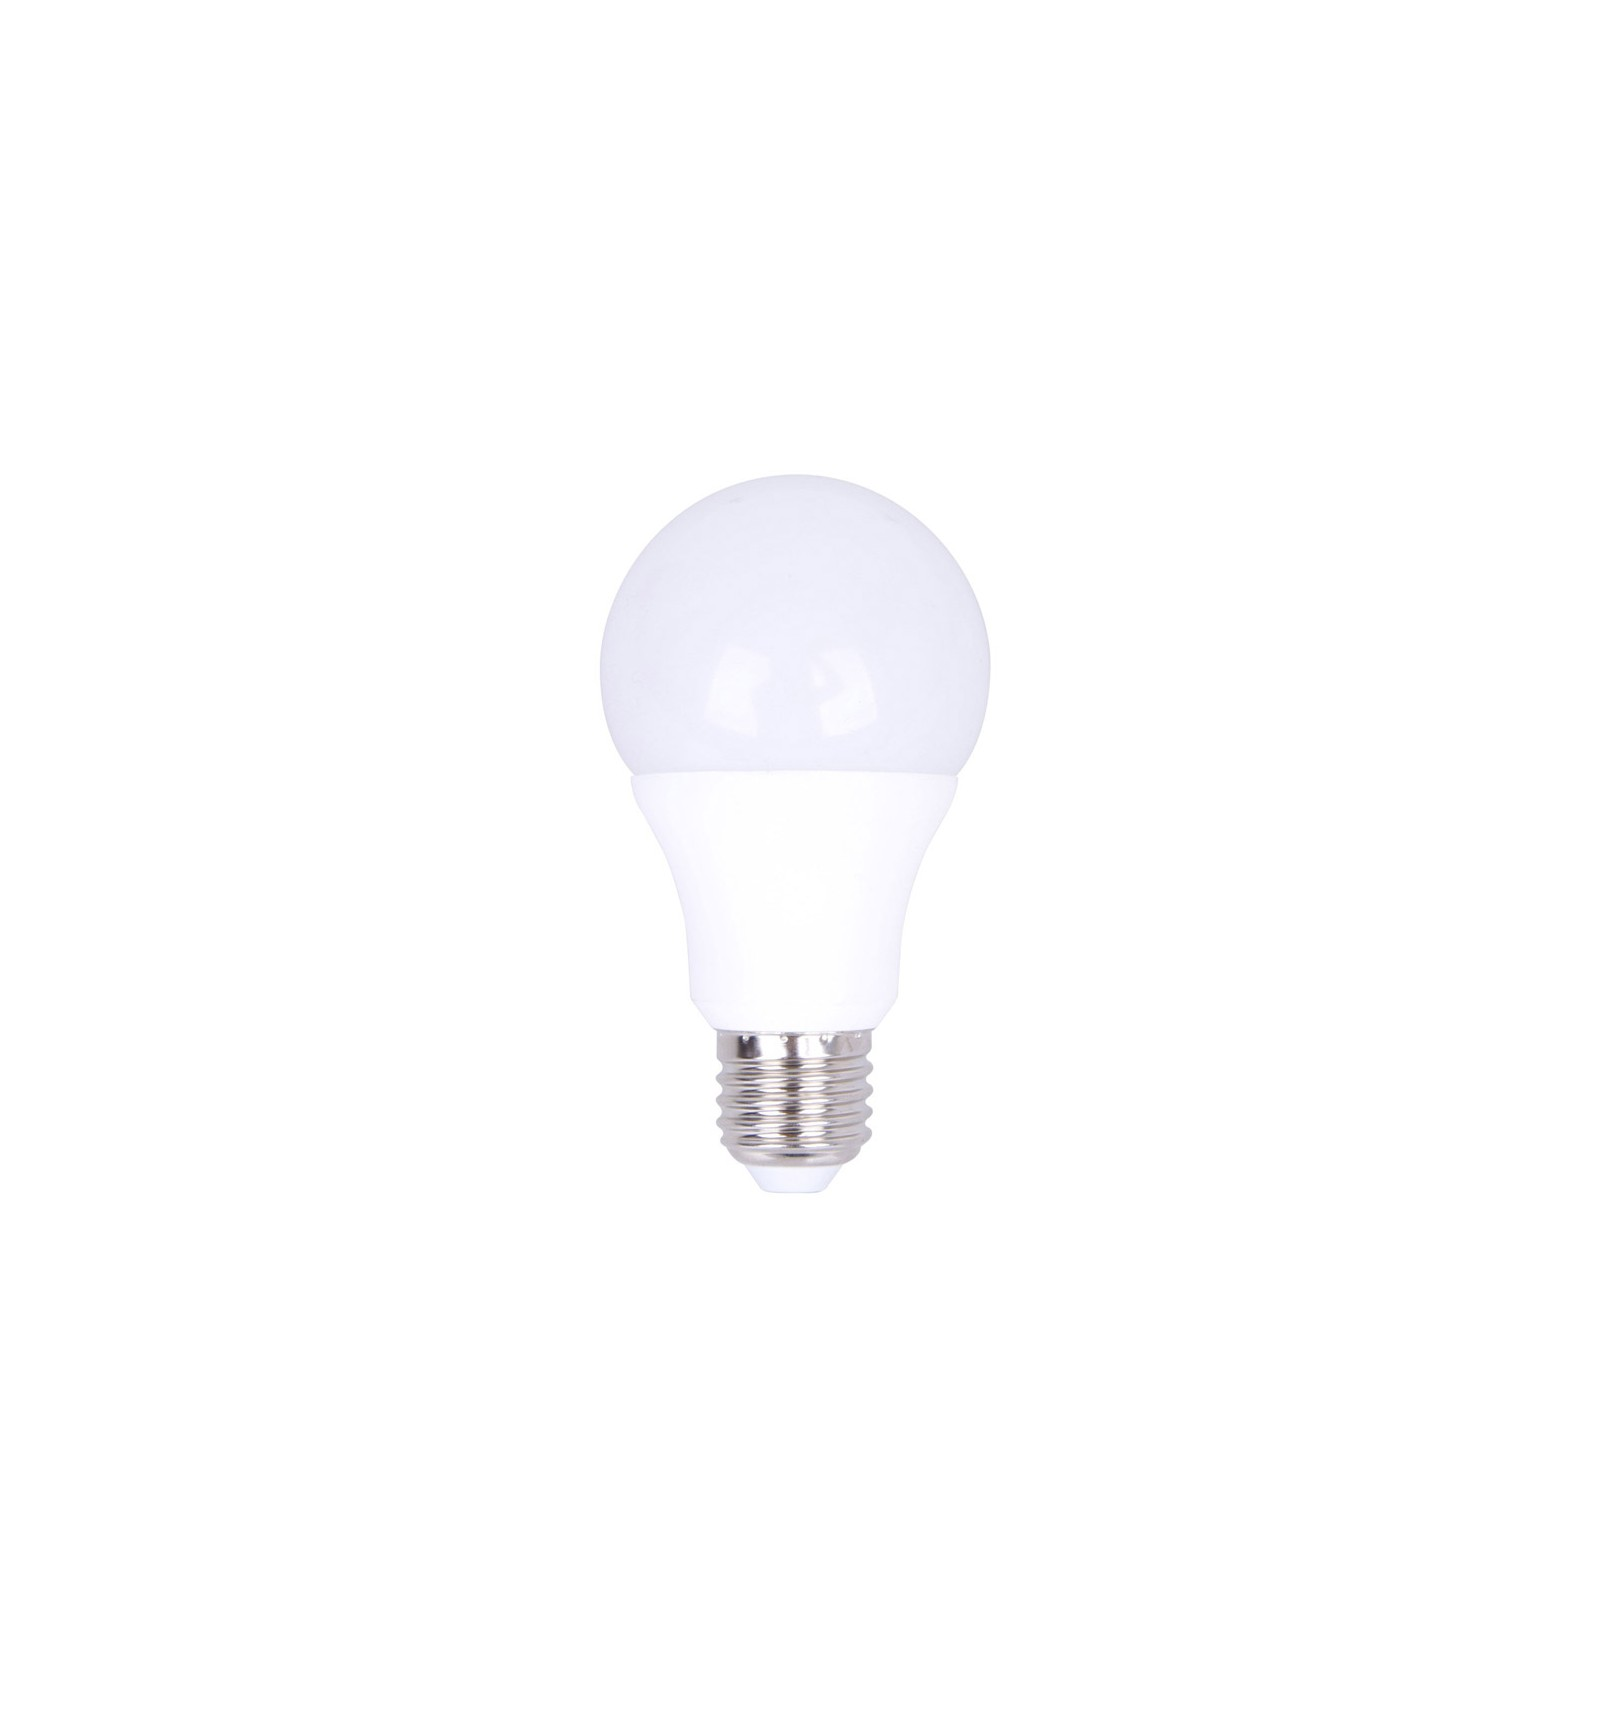 thomas watt ampoule ampoule led e globe edison ampoule vintage with thomas watt ampoule free. Black Bedroom Furniture Sets. Home Design Ideas